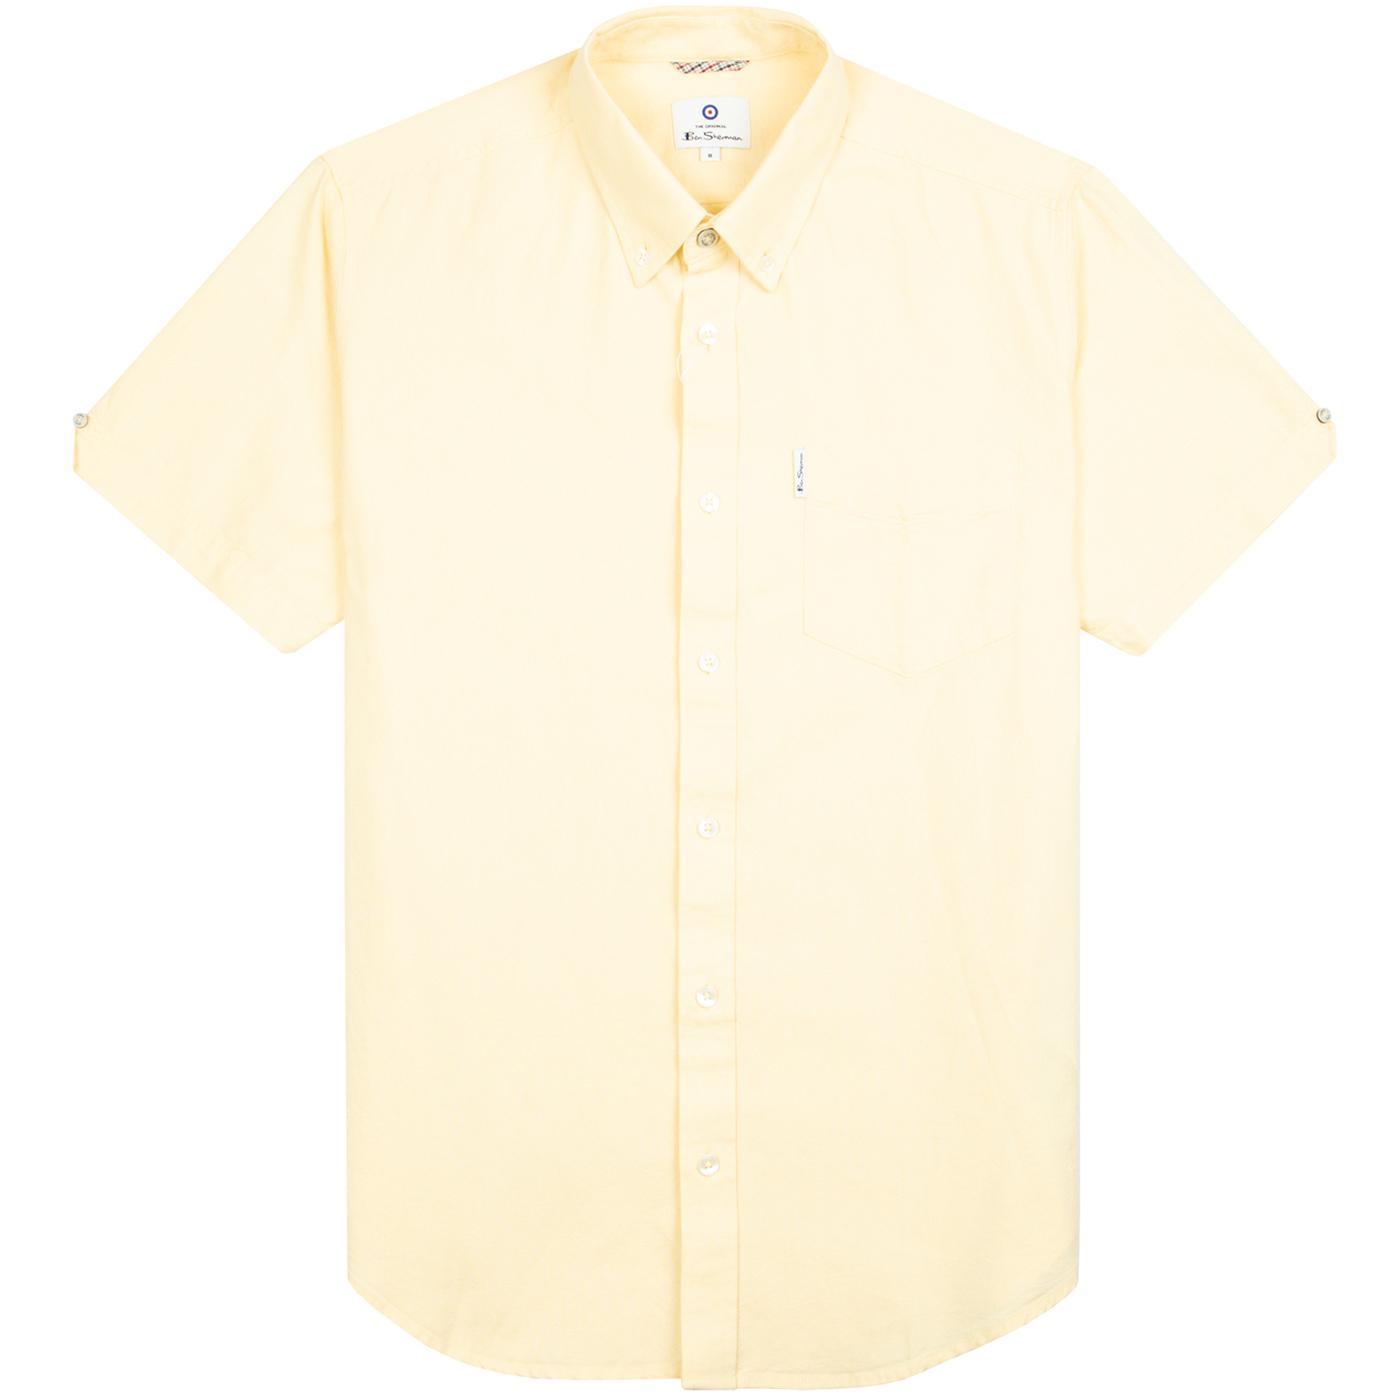 BEN SHERMAN Mod SS Signature Oxford Shirt (Yellow)